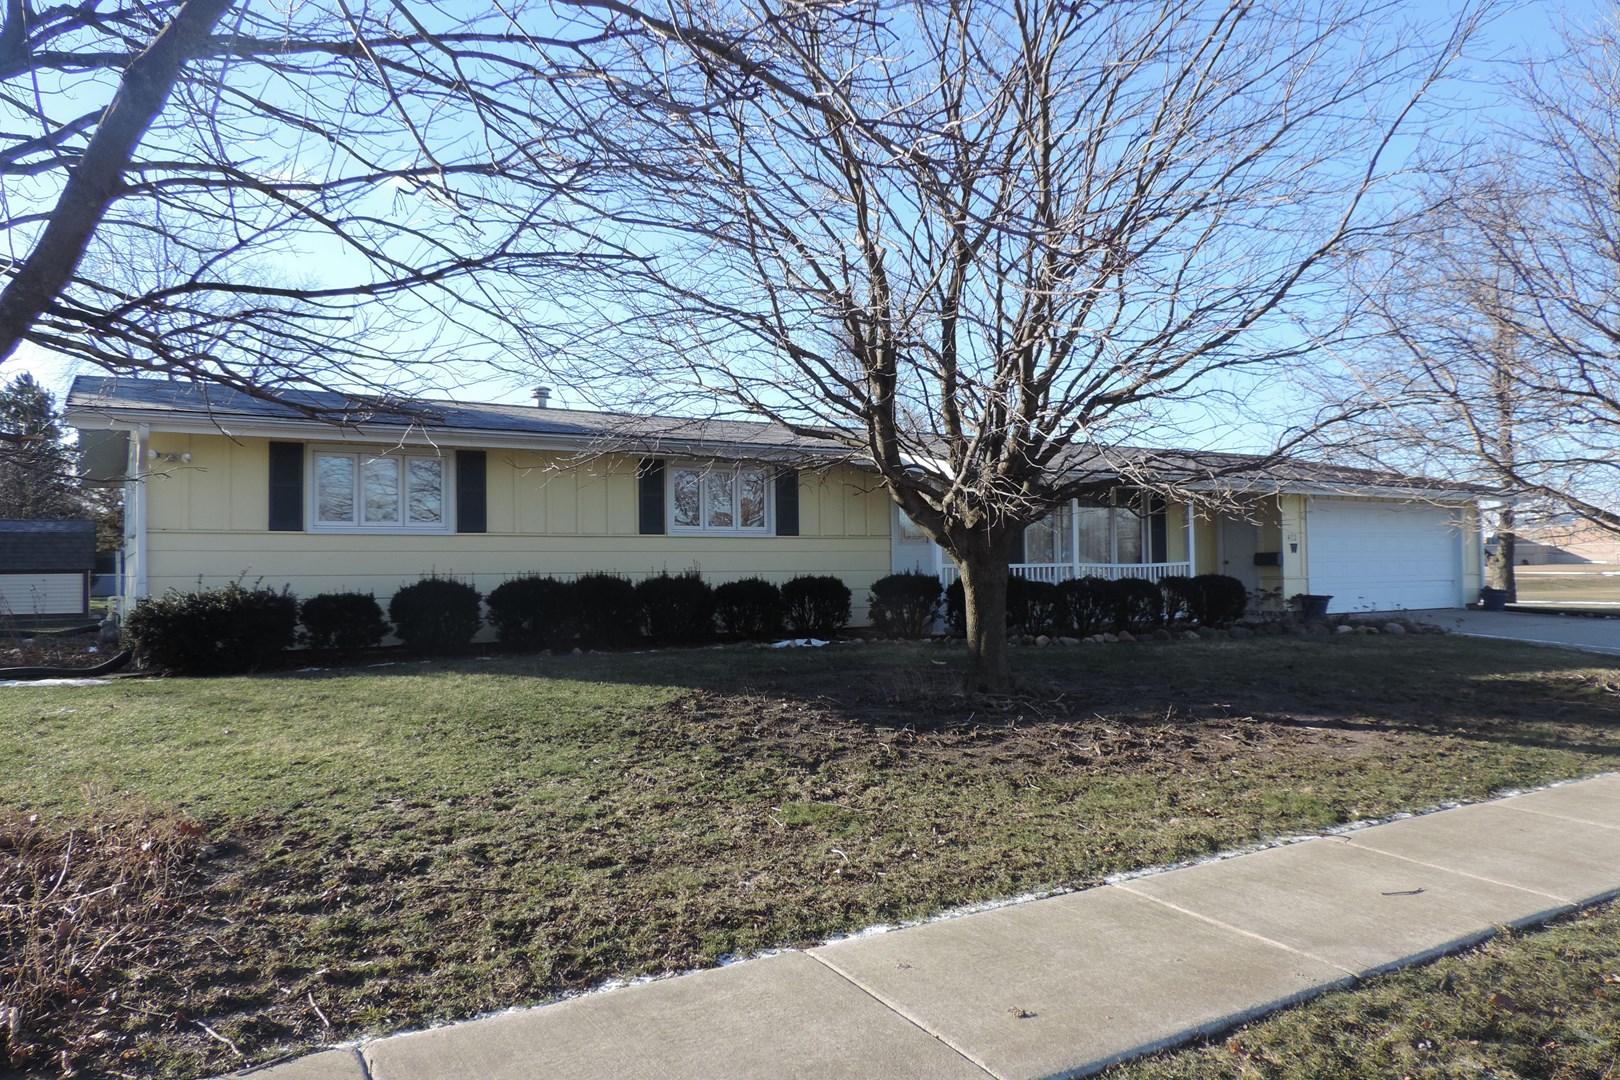 412 W Glenview Ln, Peotone, IL 60468